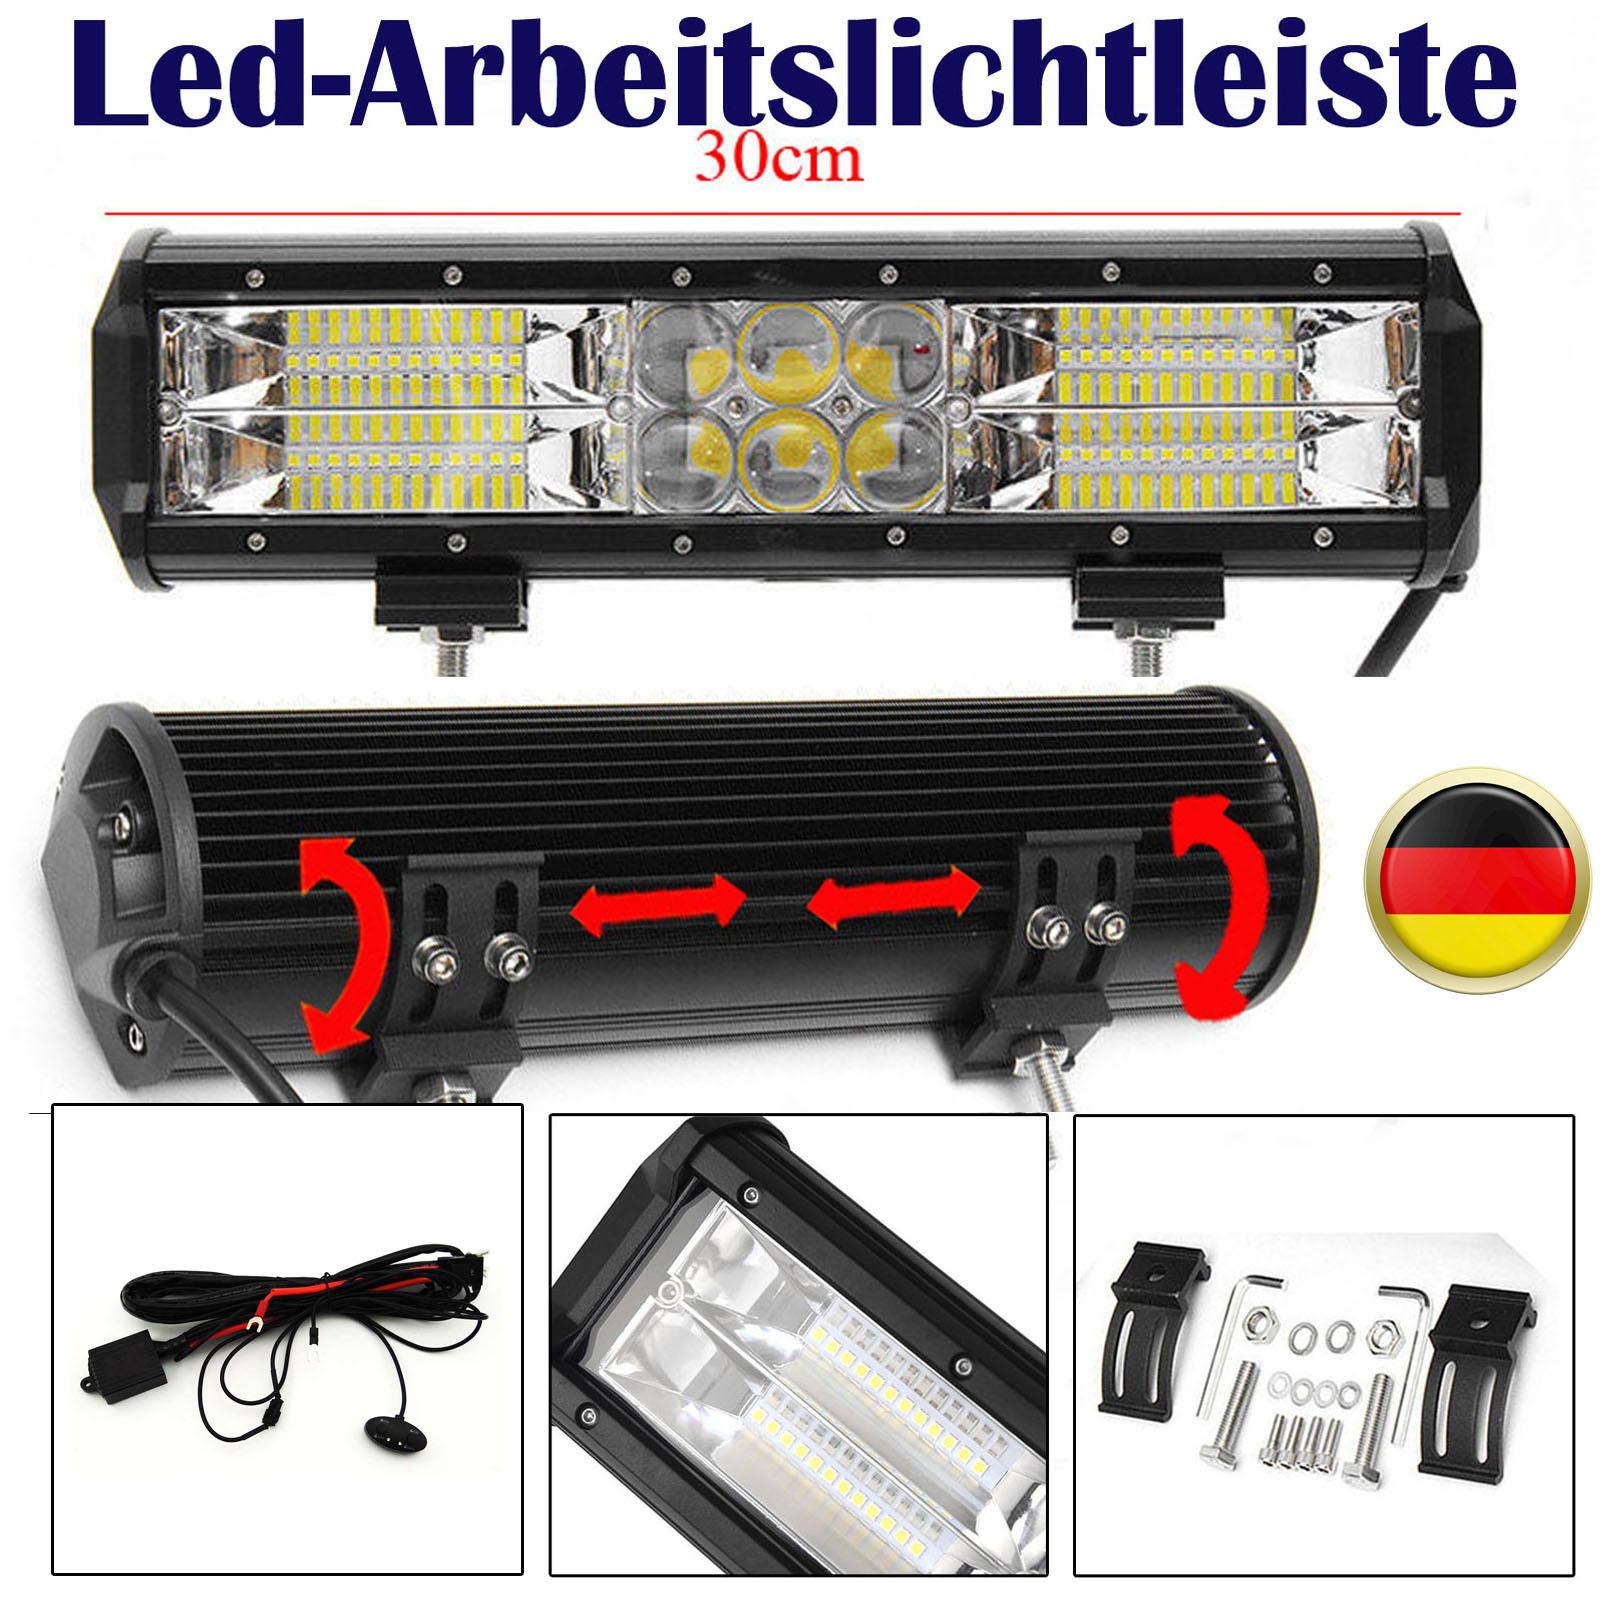 240W LED Arbeitsscheinwerfer SUV Auto LKW Jeep Lichtbalken 12V 24V + ...